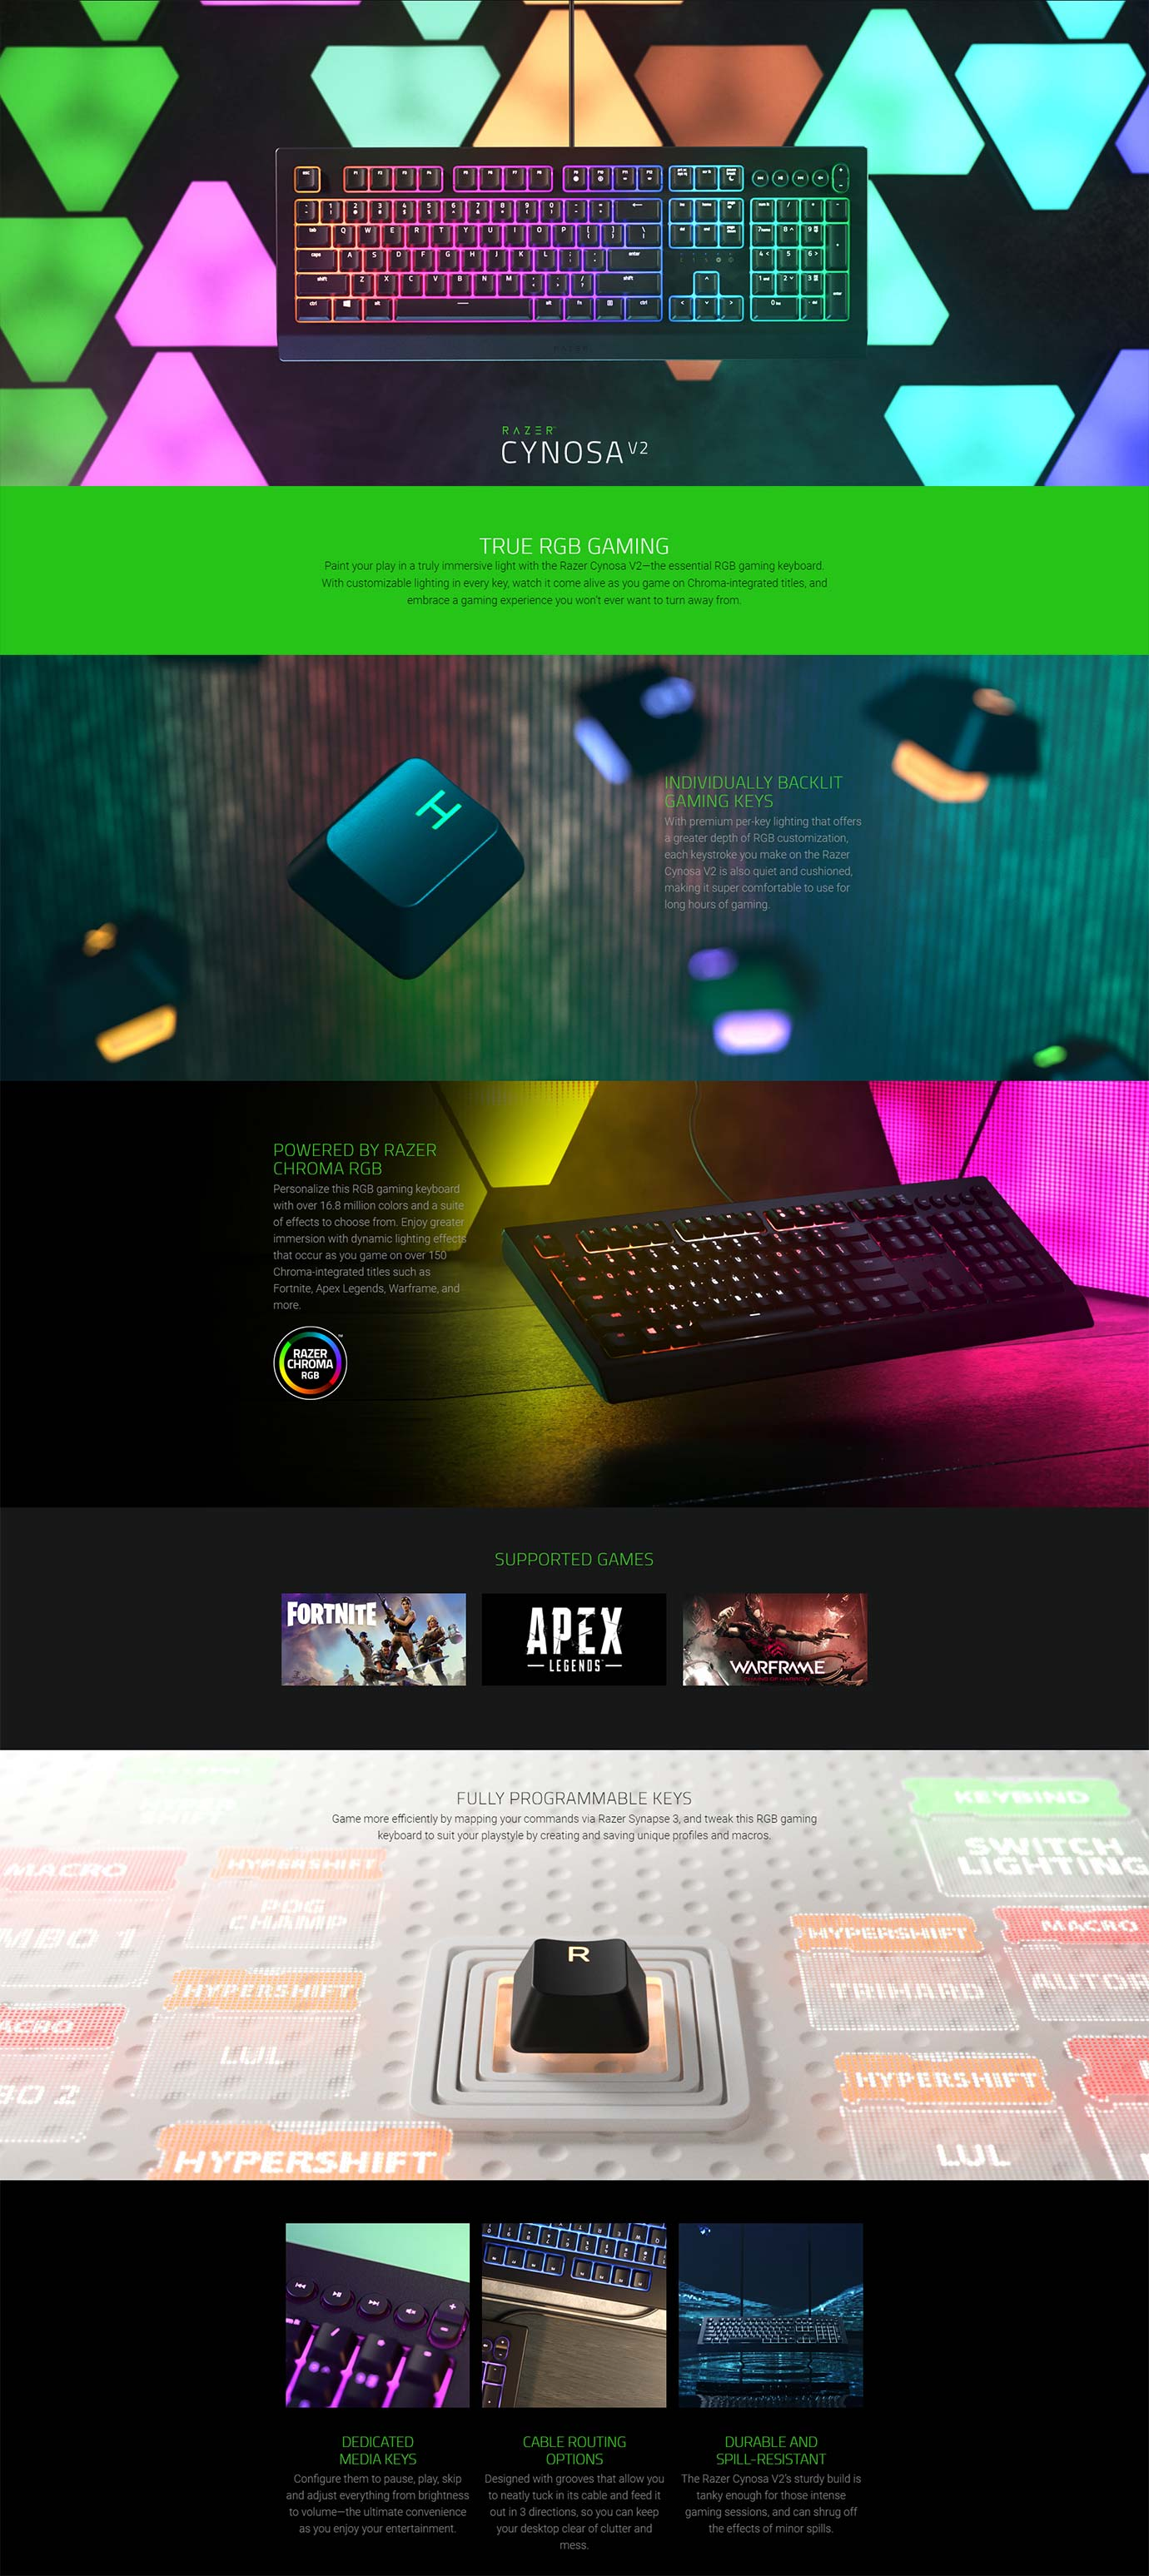 Razer Cynosa V2 RGB Membrane Gaming Keyboard | Wireless 1